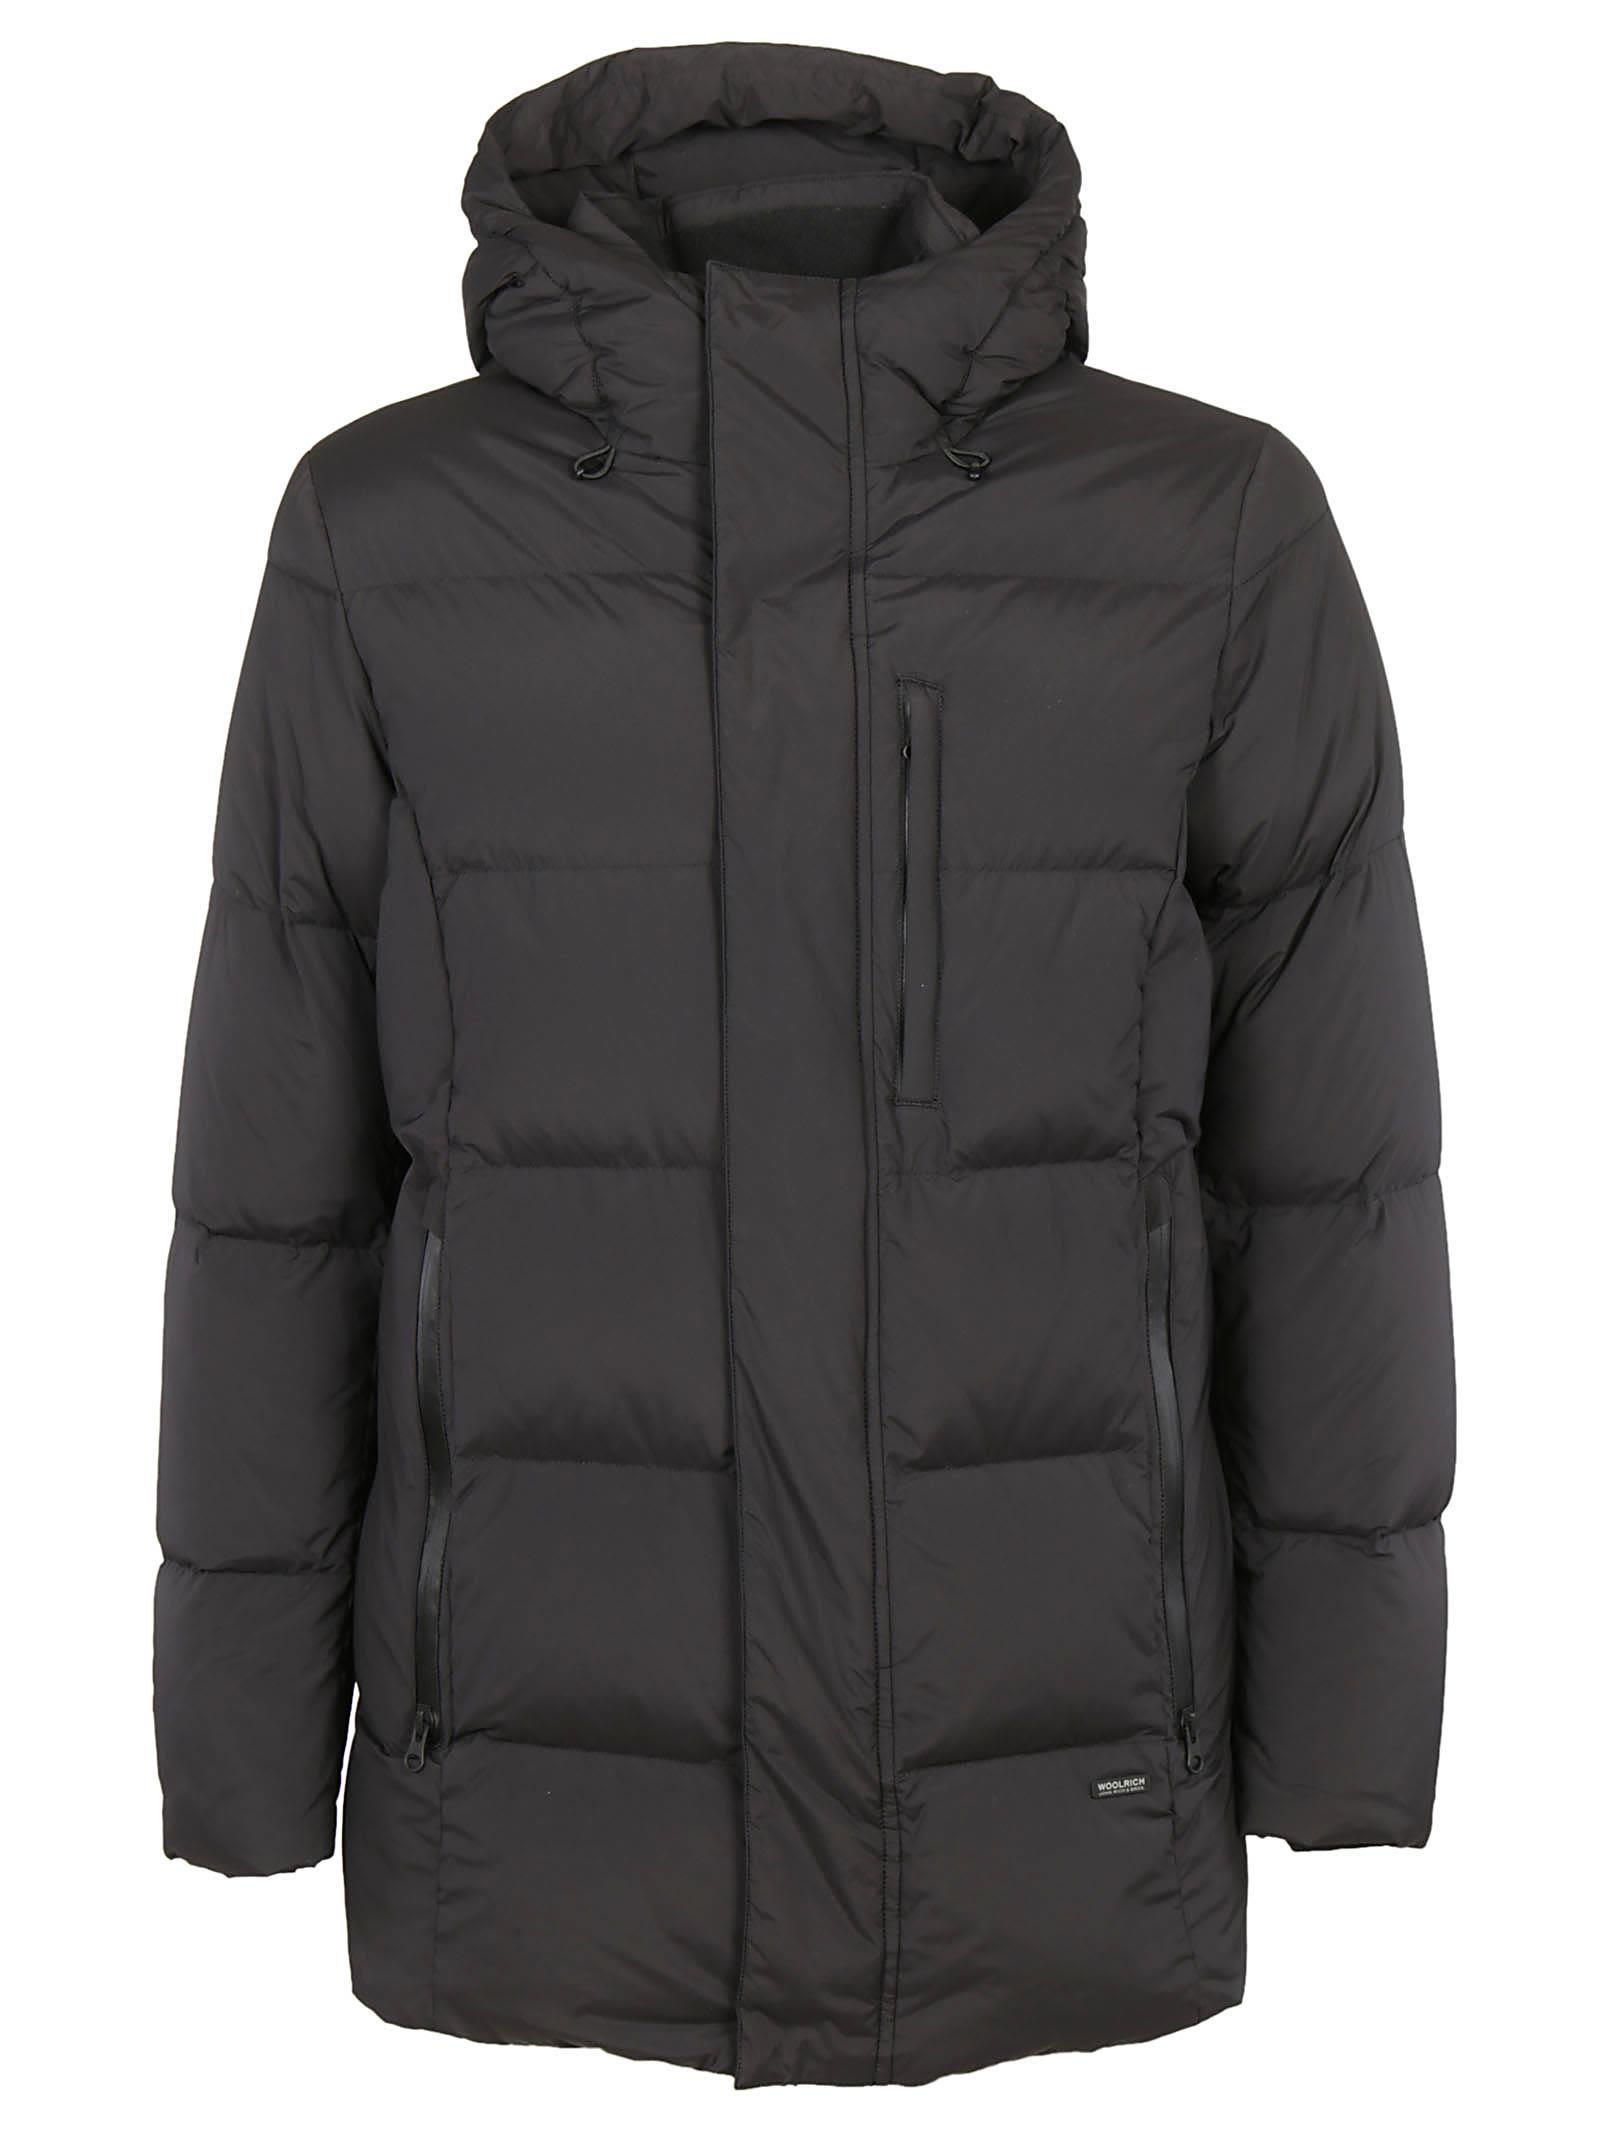 woolrich woolrich comfort parka black men 39 s coats italist. Black Bedroom Furniture Sets. Home Design Ideas